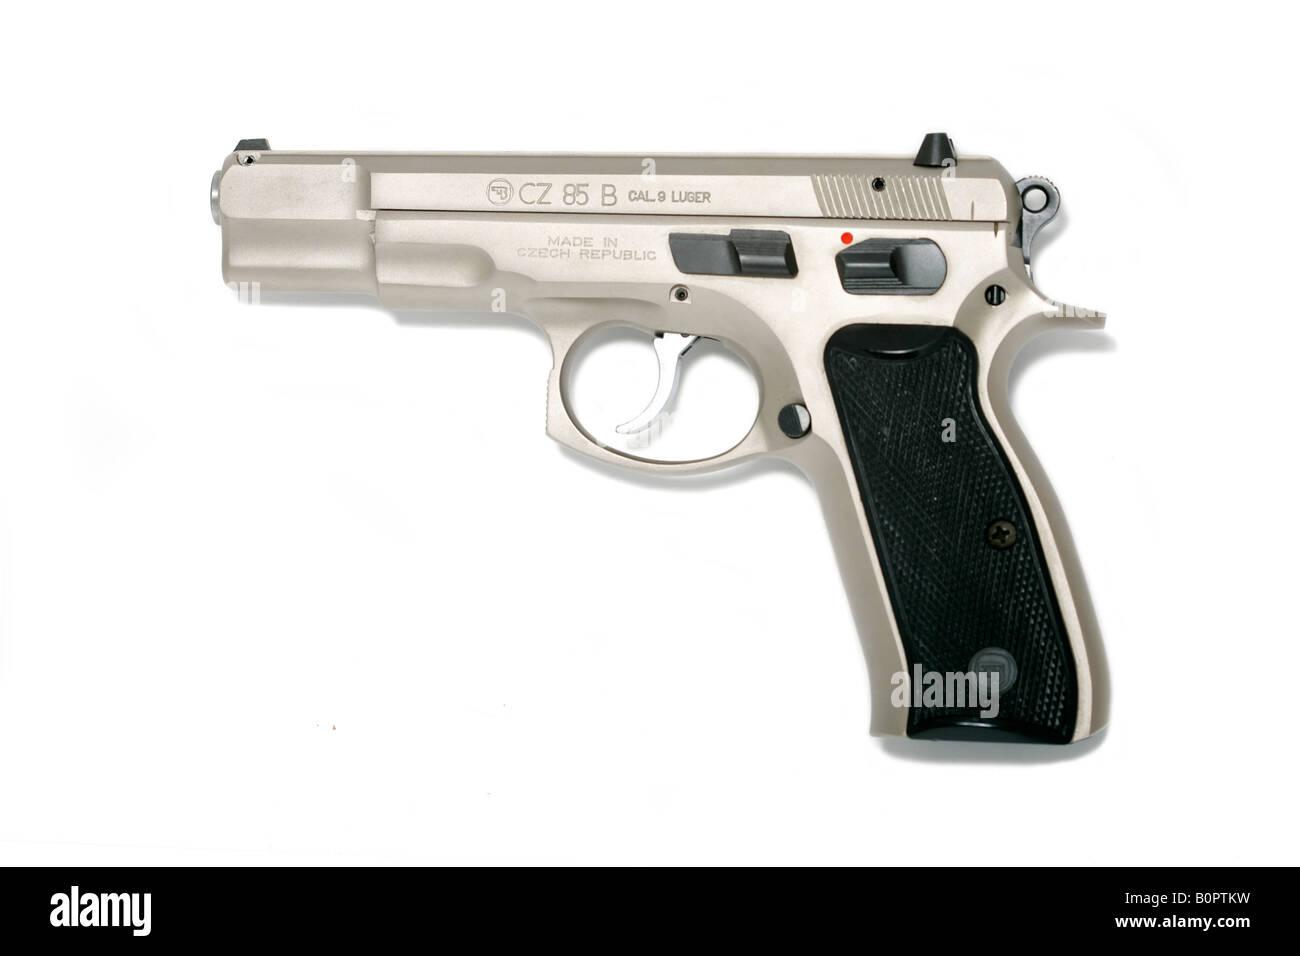 CZ 85 Chrome pistol handgun hand gun Stock Photo: 17712685 - Alamy